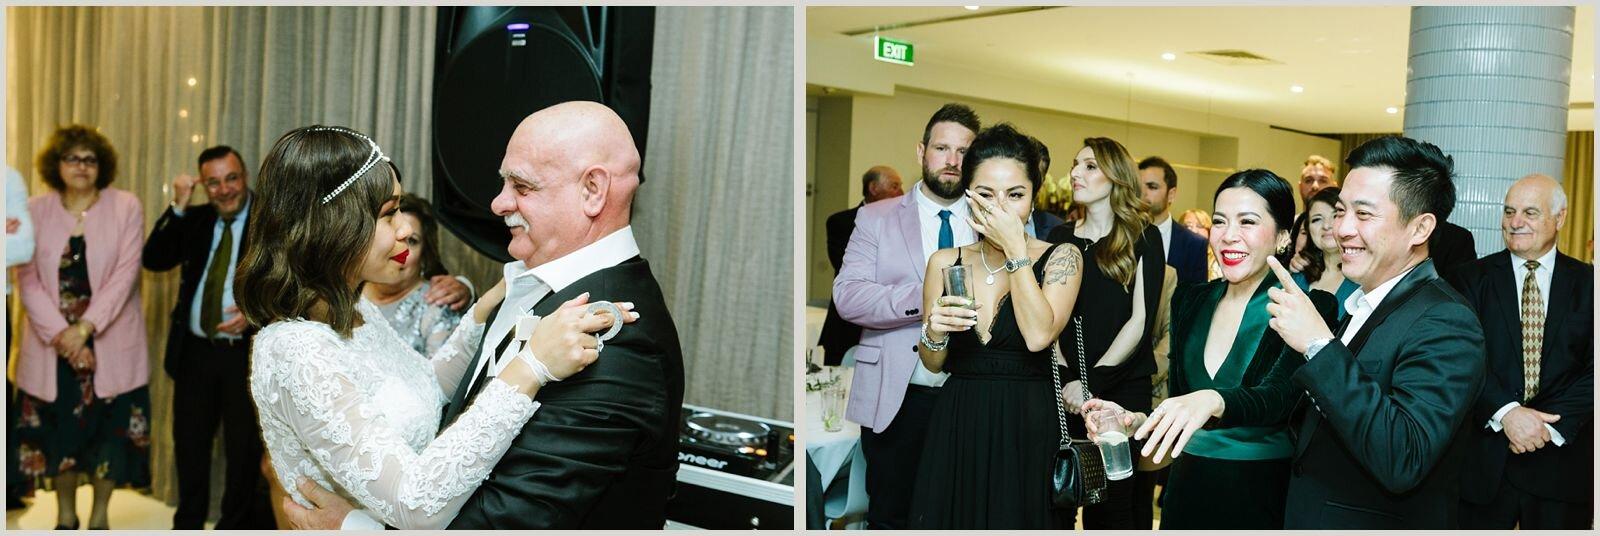 joseph_koprek_wedding_melbourne_the_prince_deck_0101.jpg